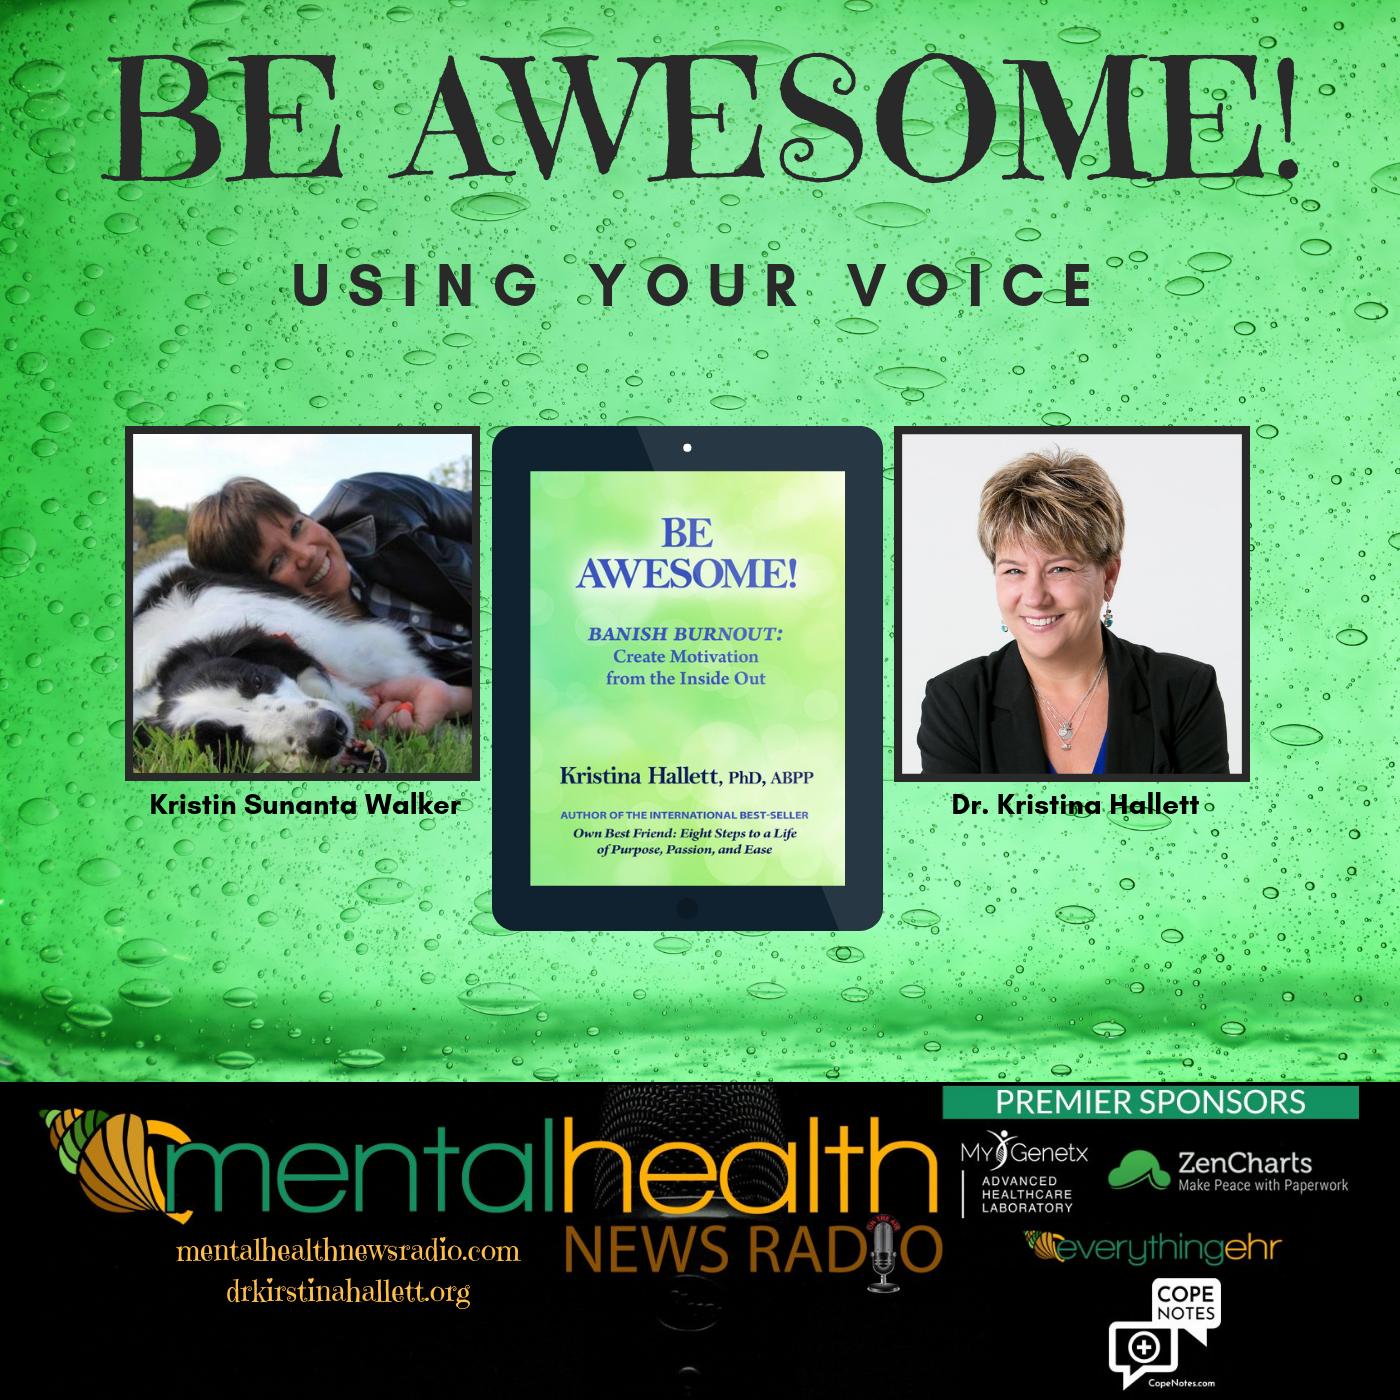 Clinical Psychologist Author And Executive Coach Dr Kristina